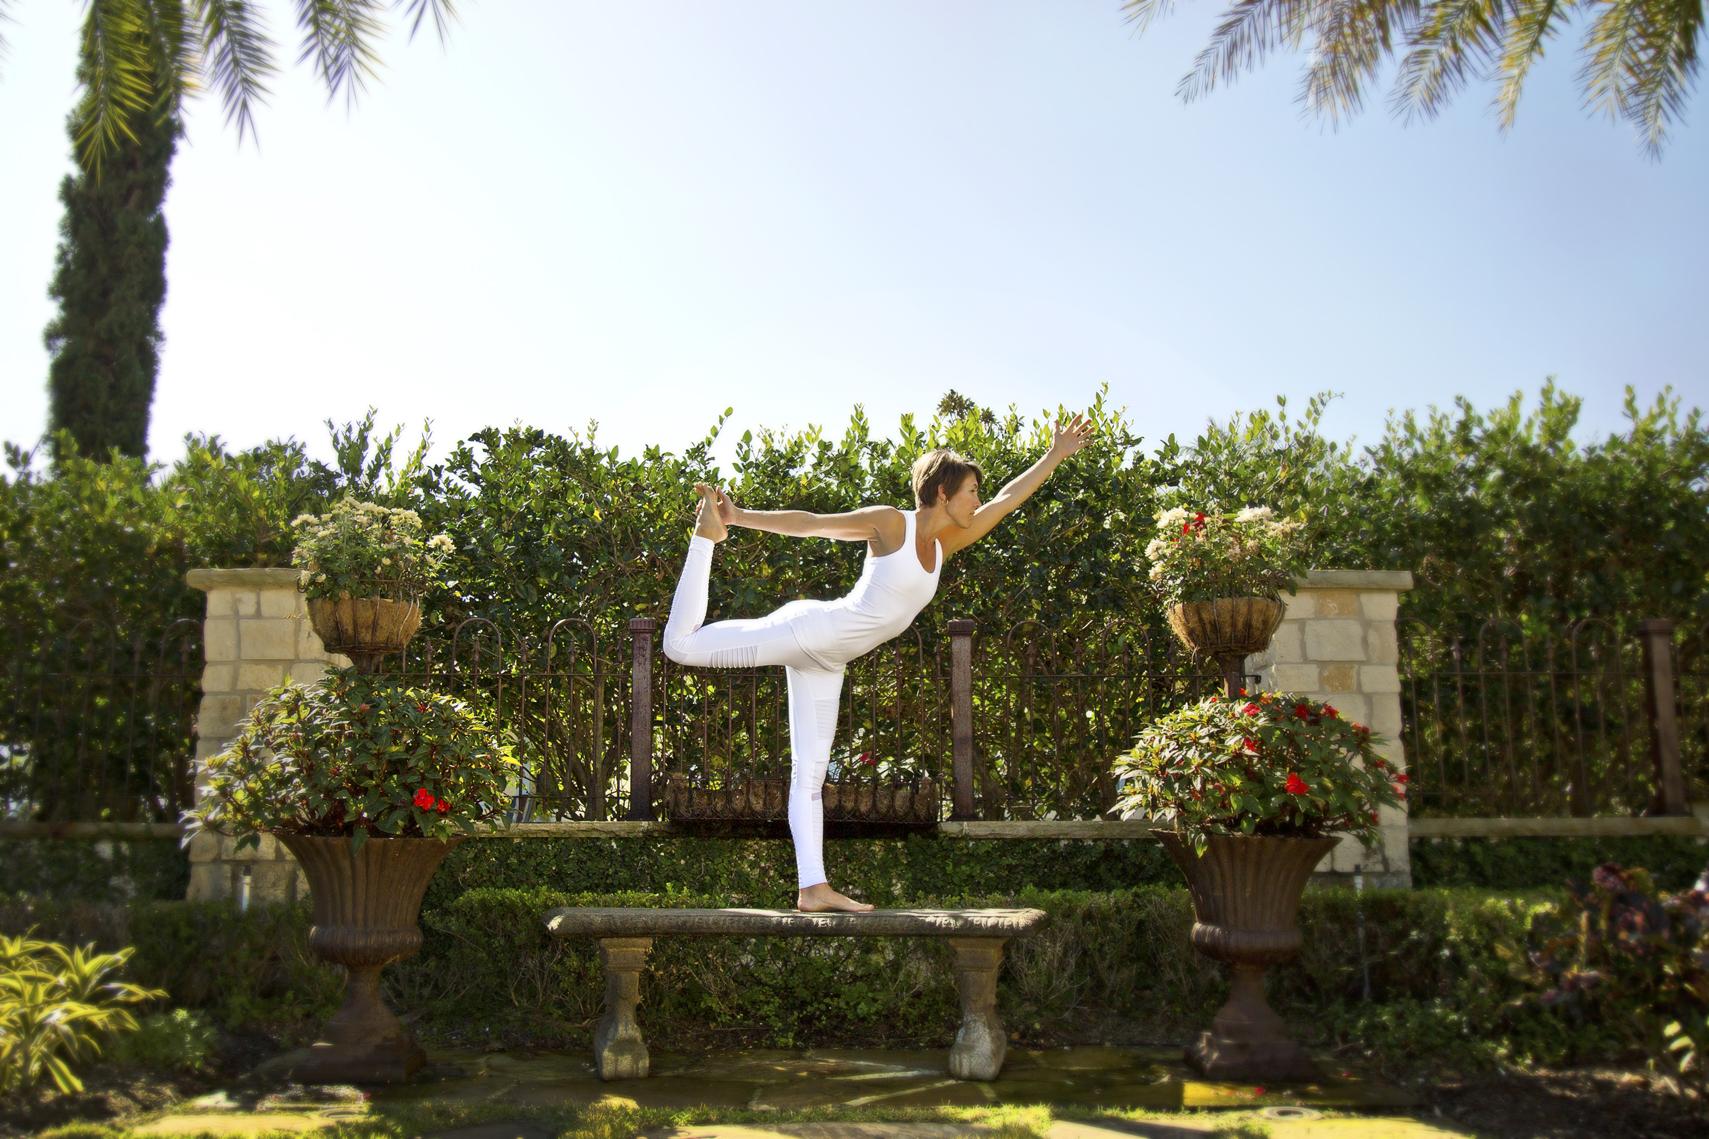 yoga_white_beautiful_sarasota_photography_pose